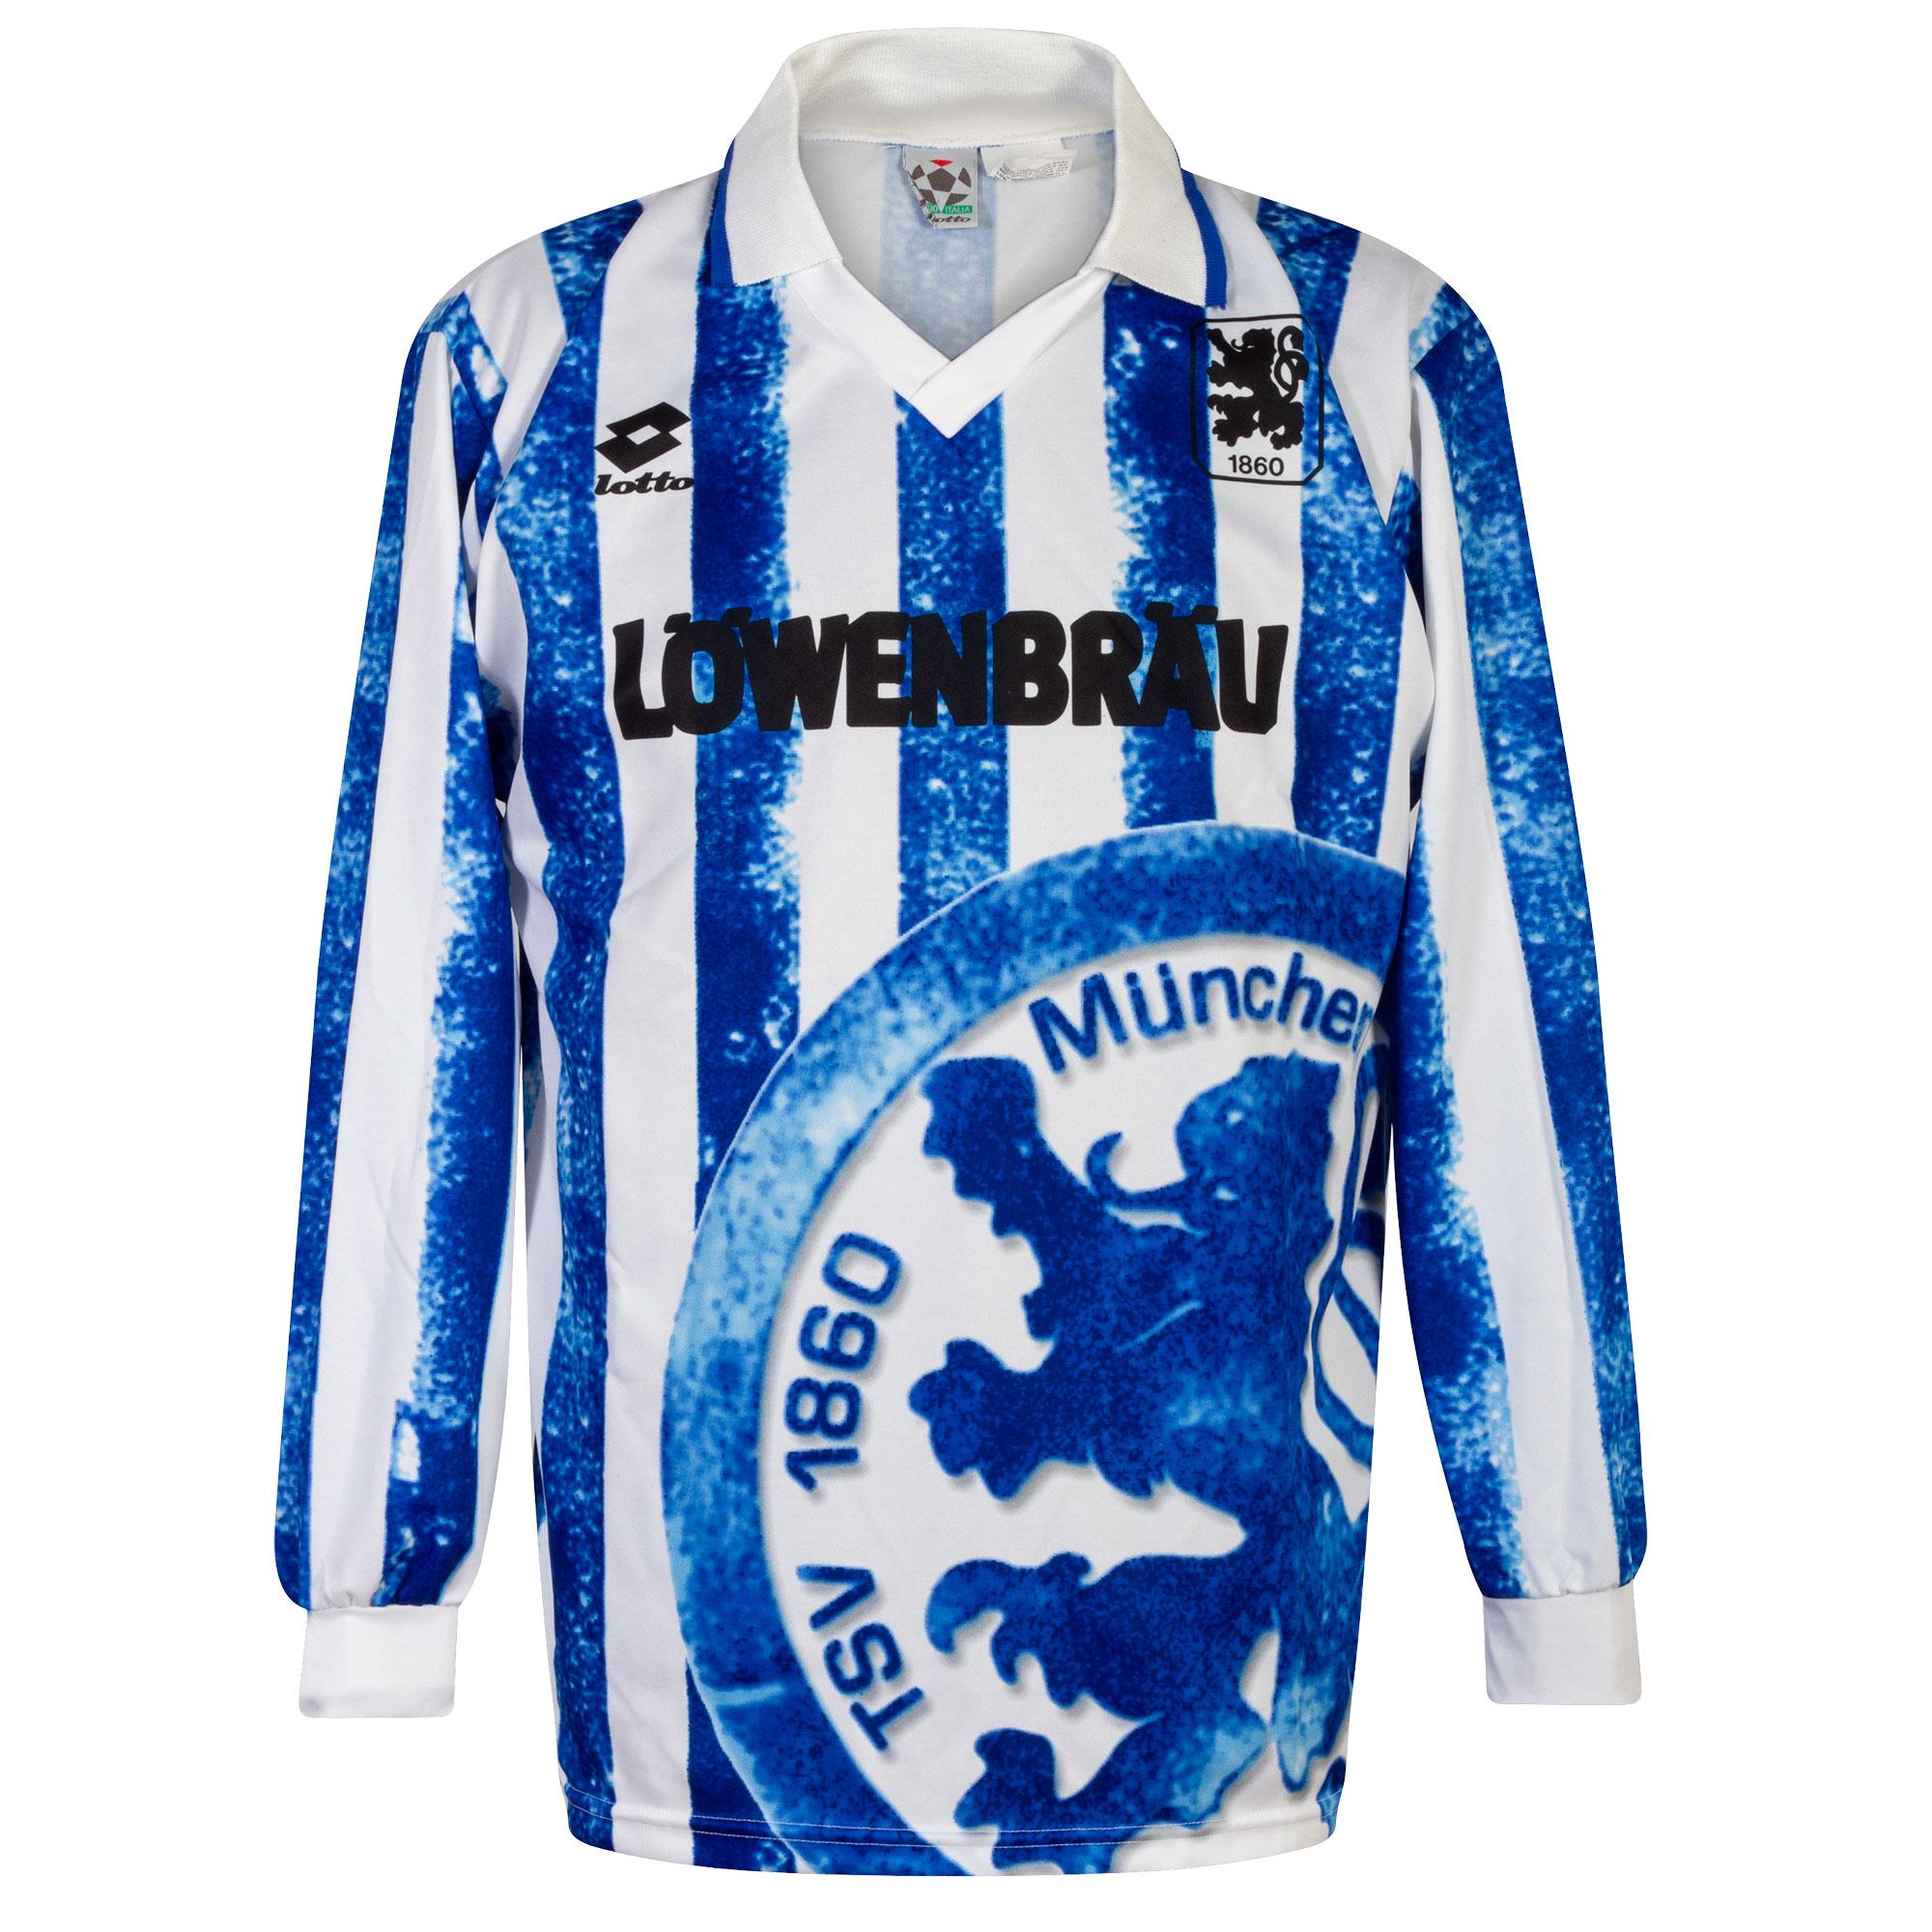 Retro 1860 Munich Shirt